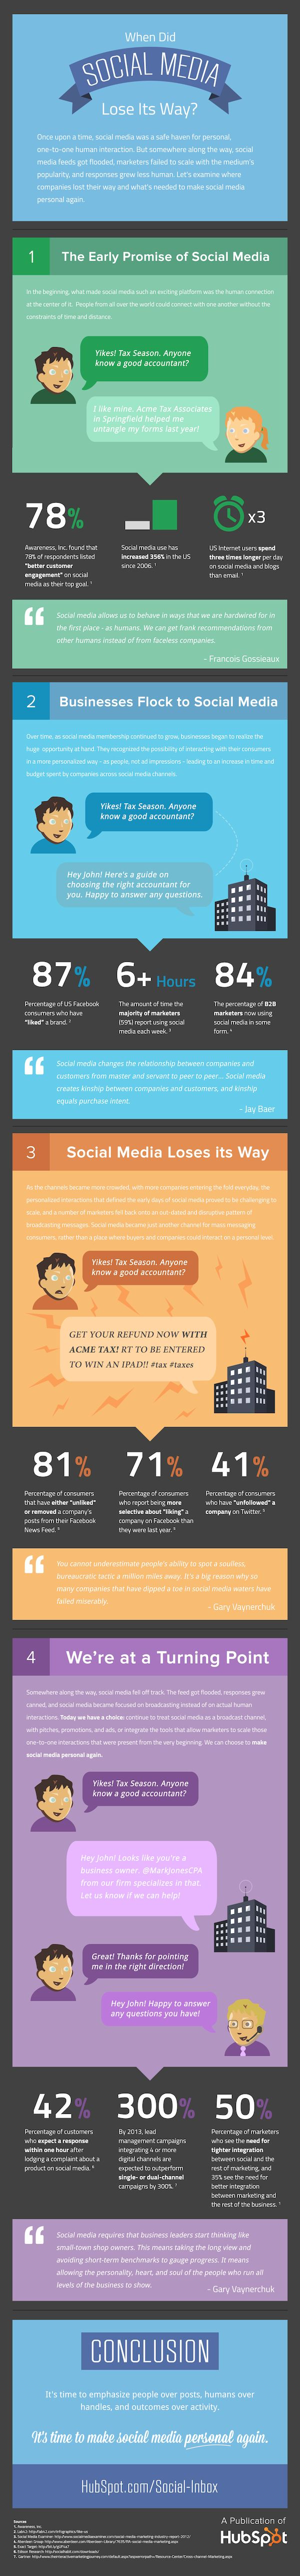 Social-Media-LifeCycle | blog.hubspot.com